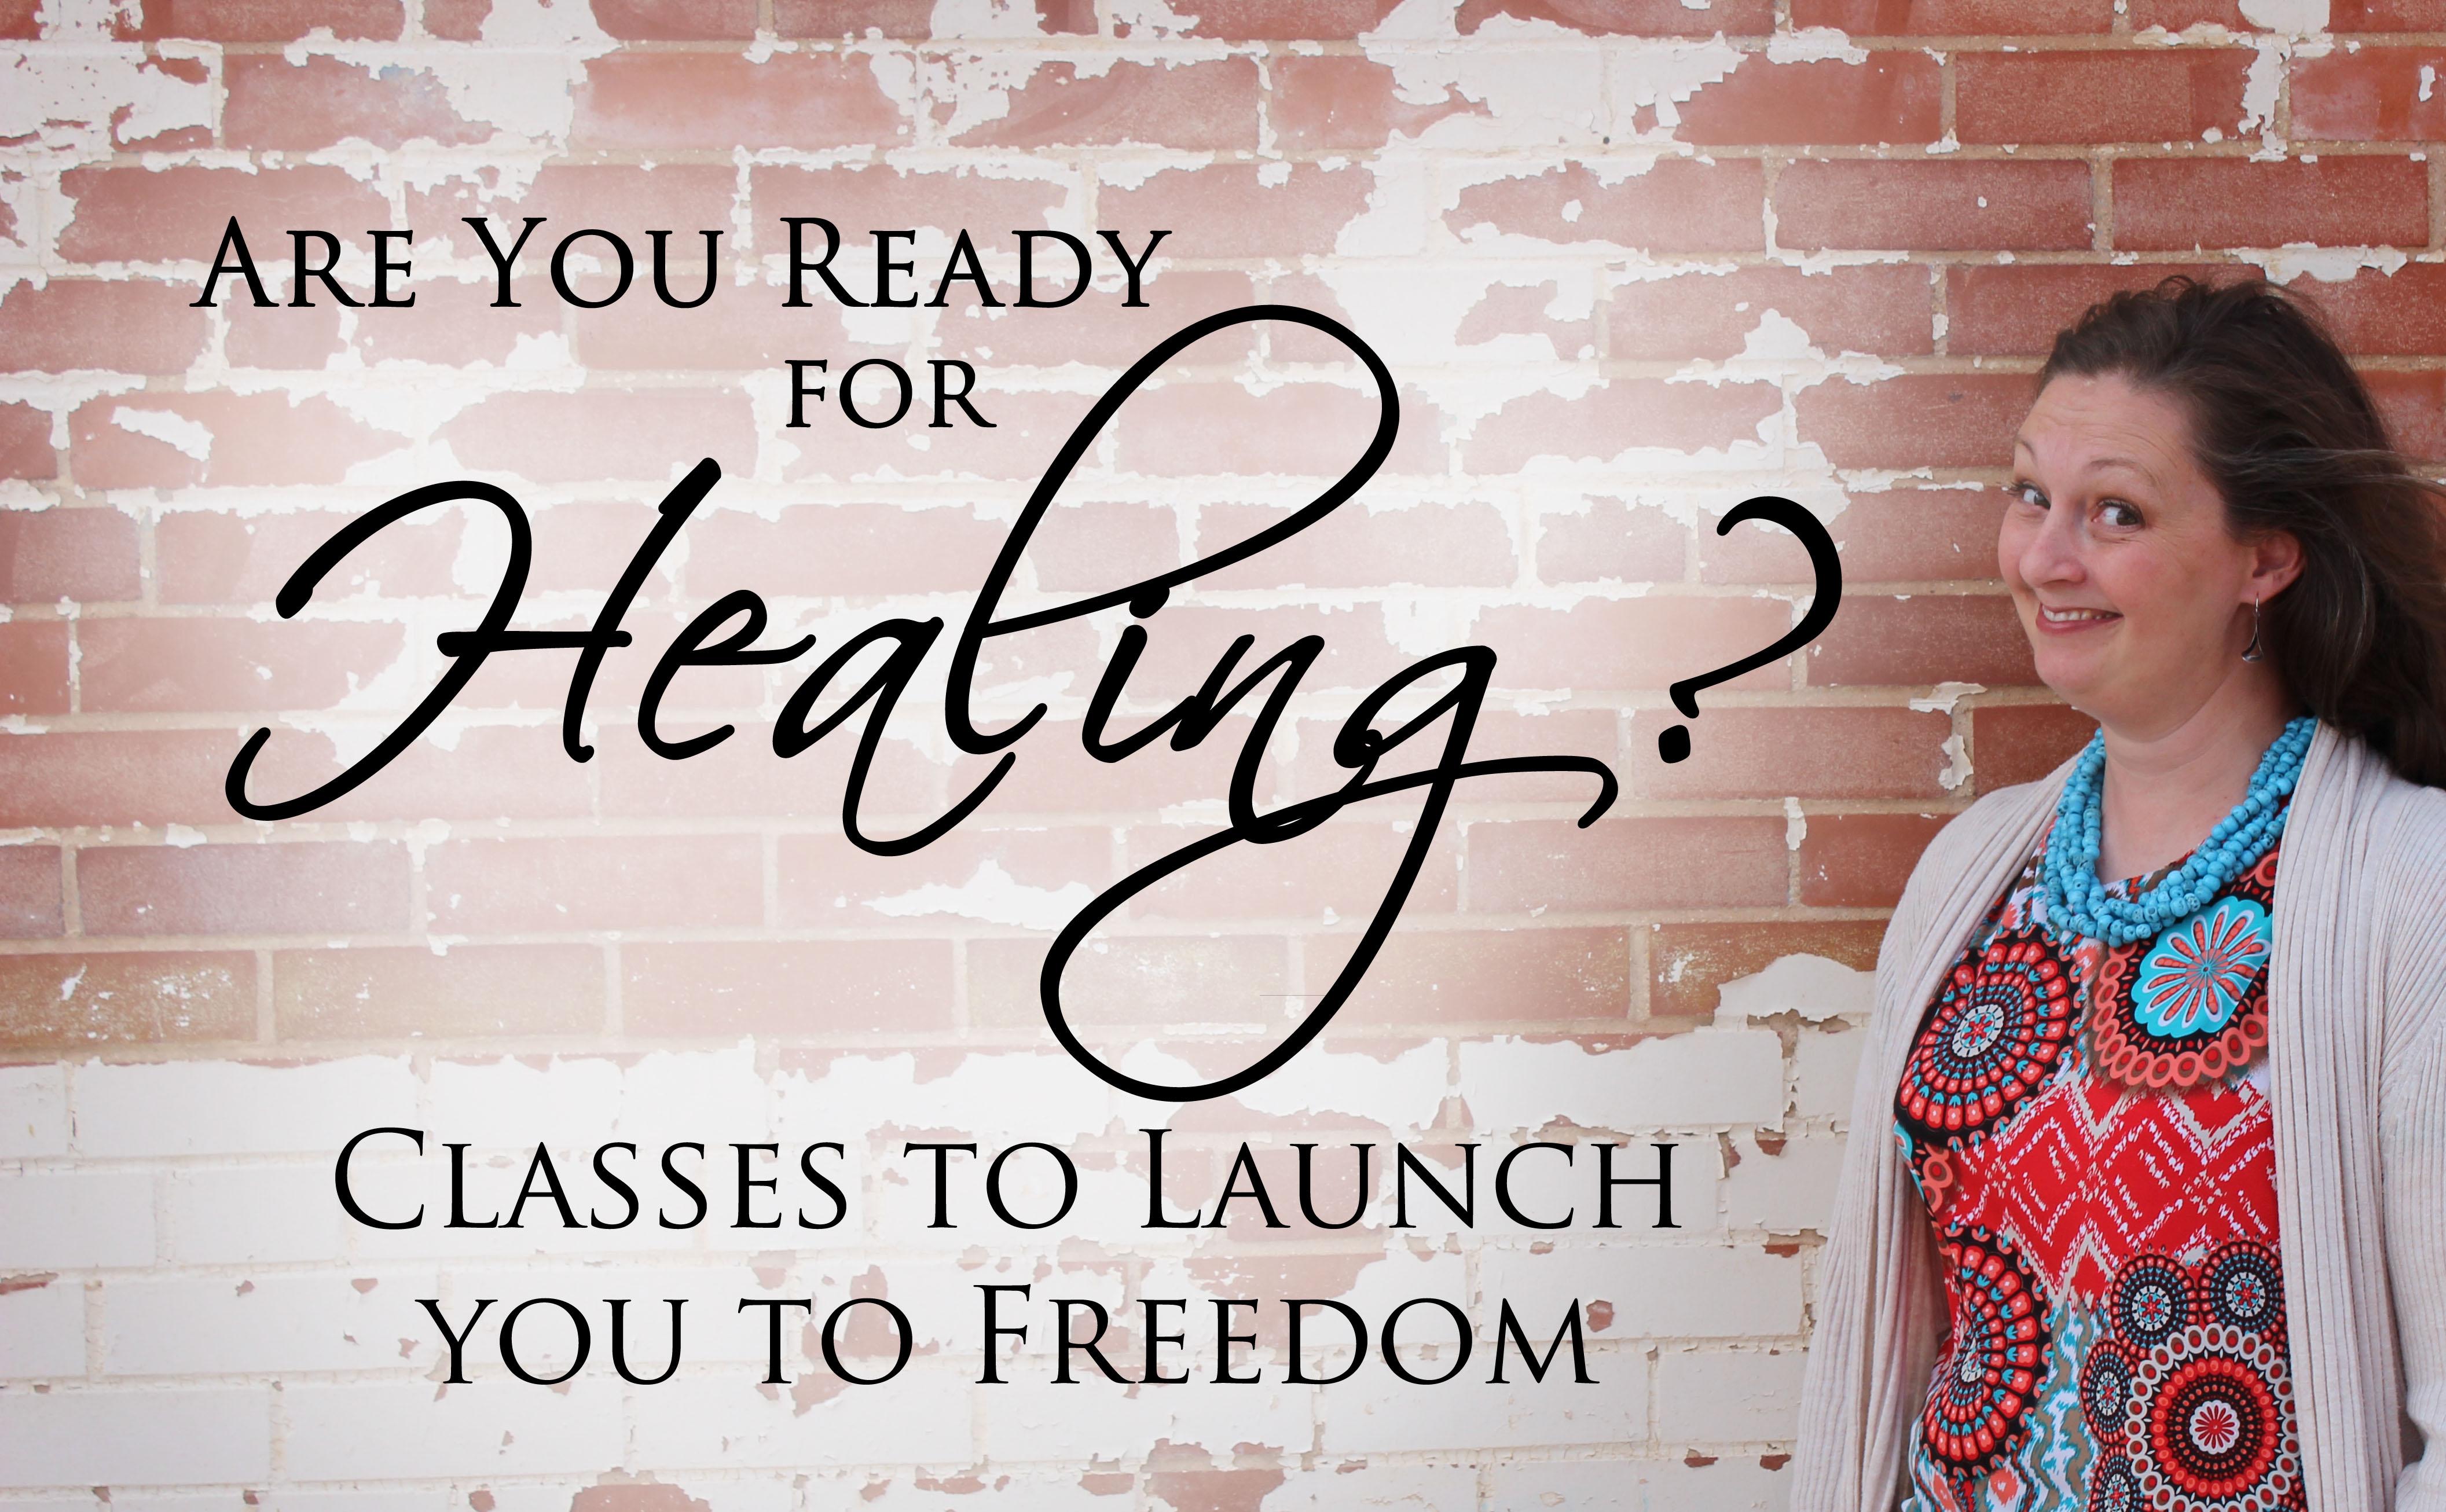 Classes Emotional Spiritual Healing Freedom